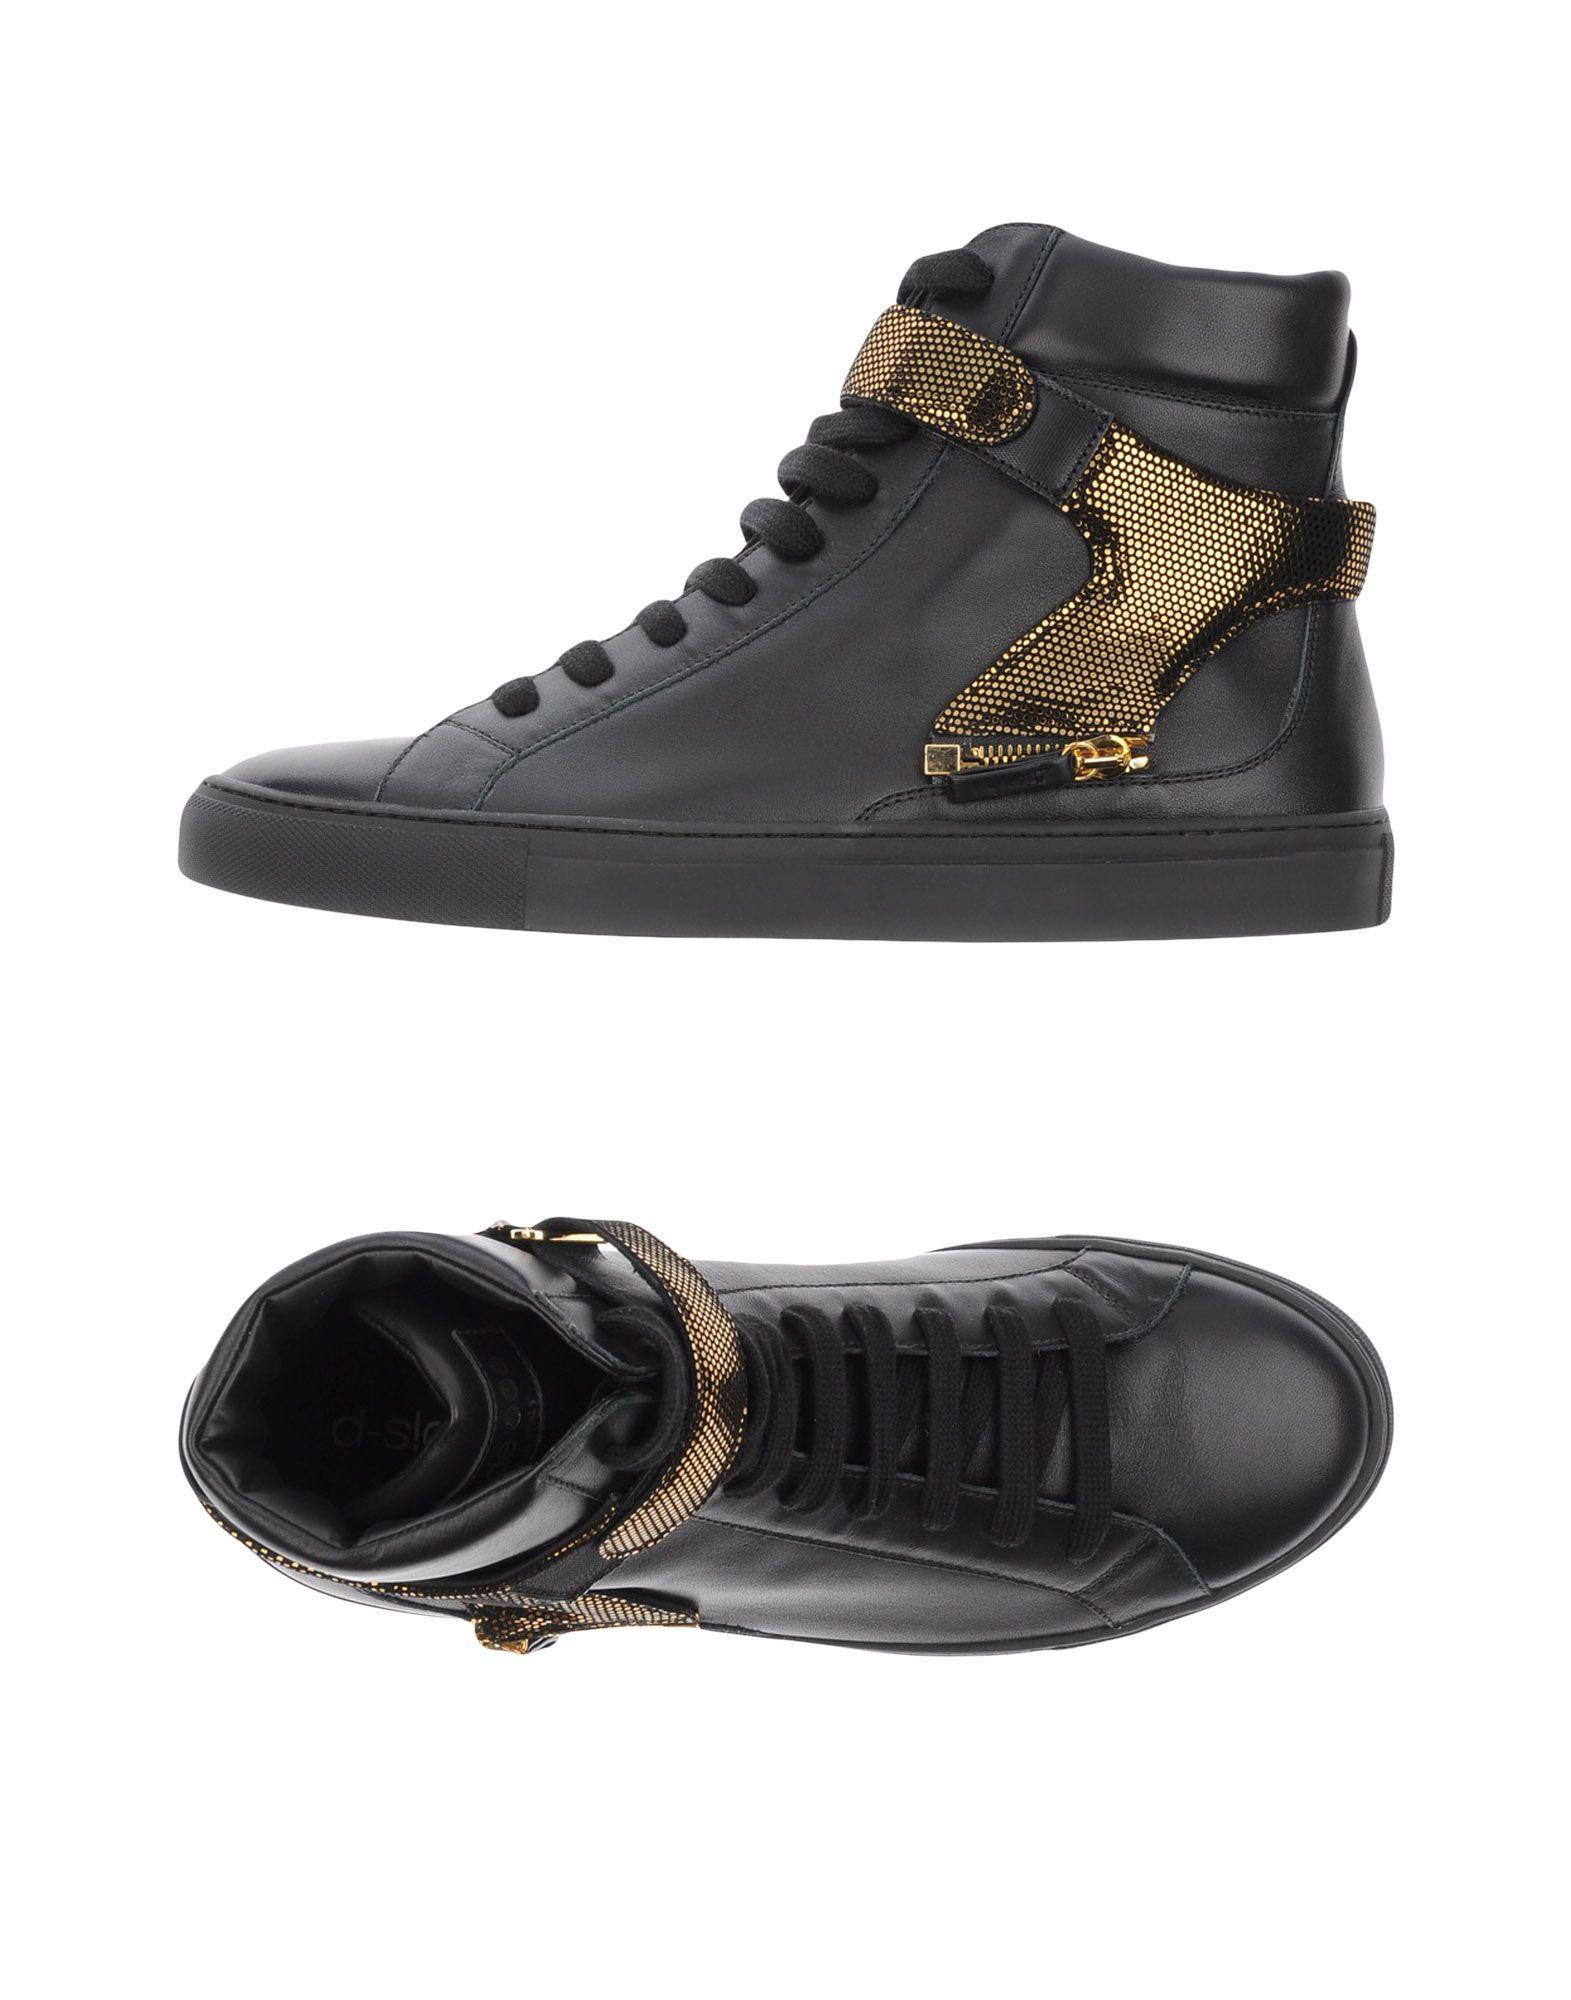 FOOTWEAR - High-tops & sneakers d-s!de G2csx